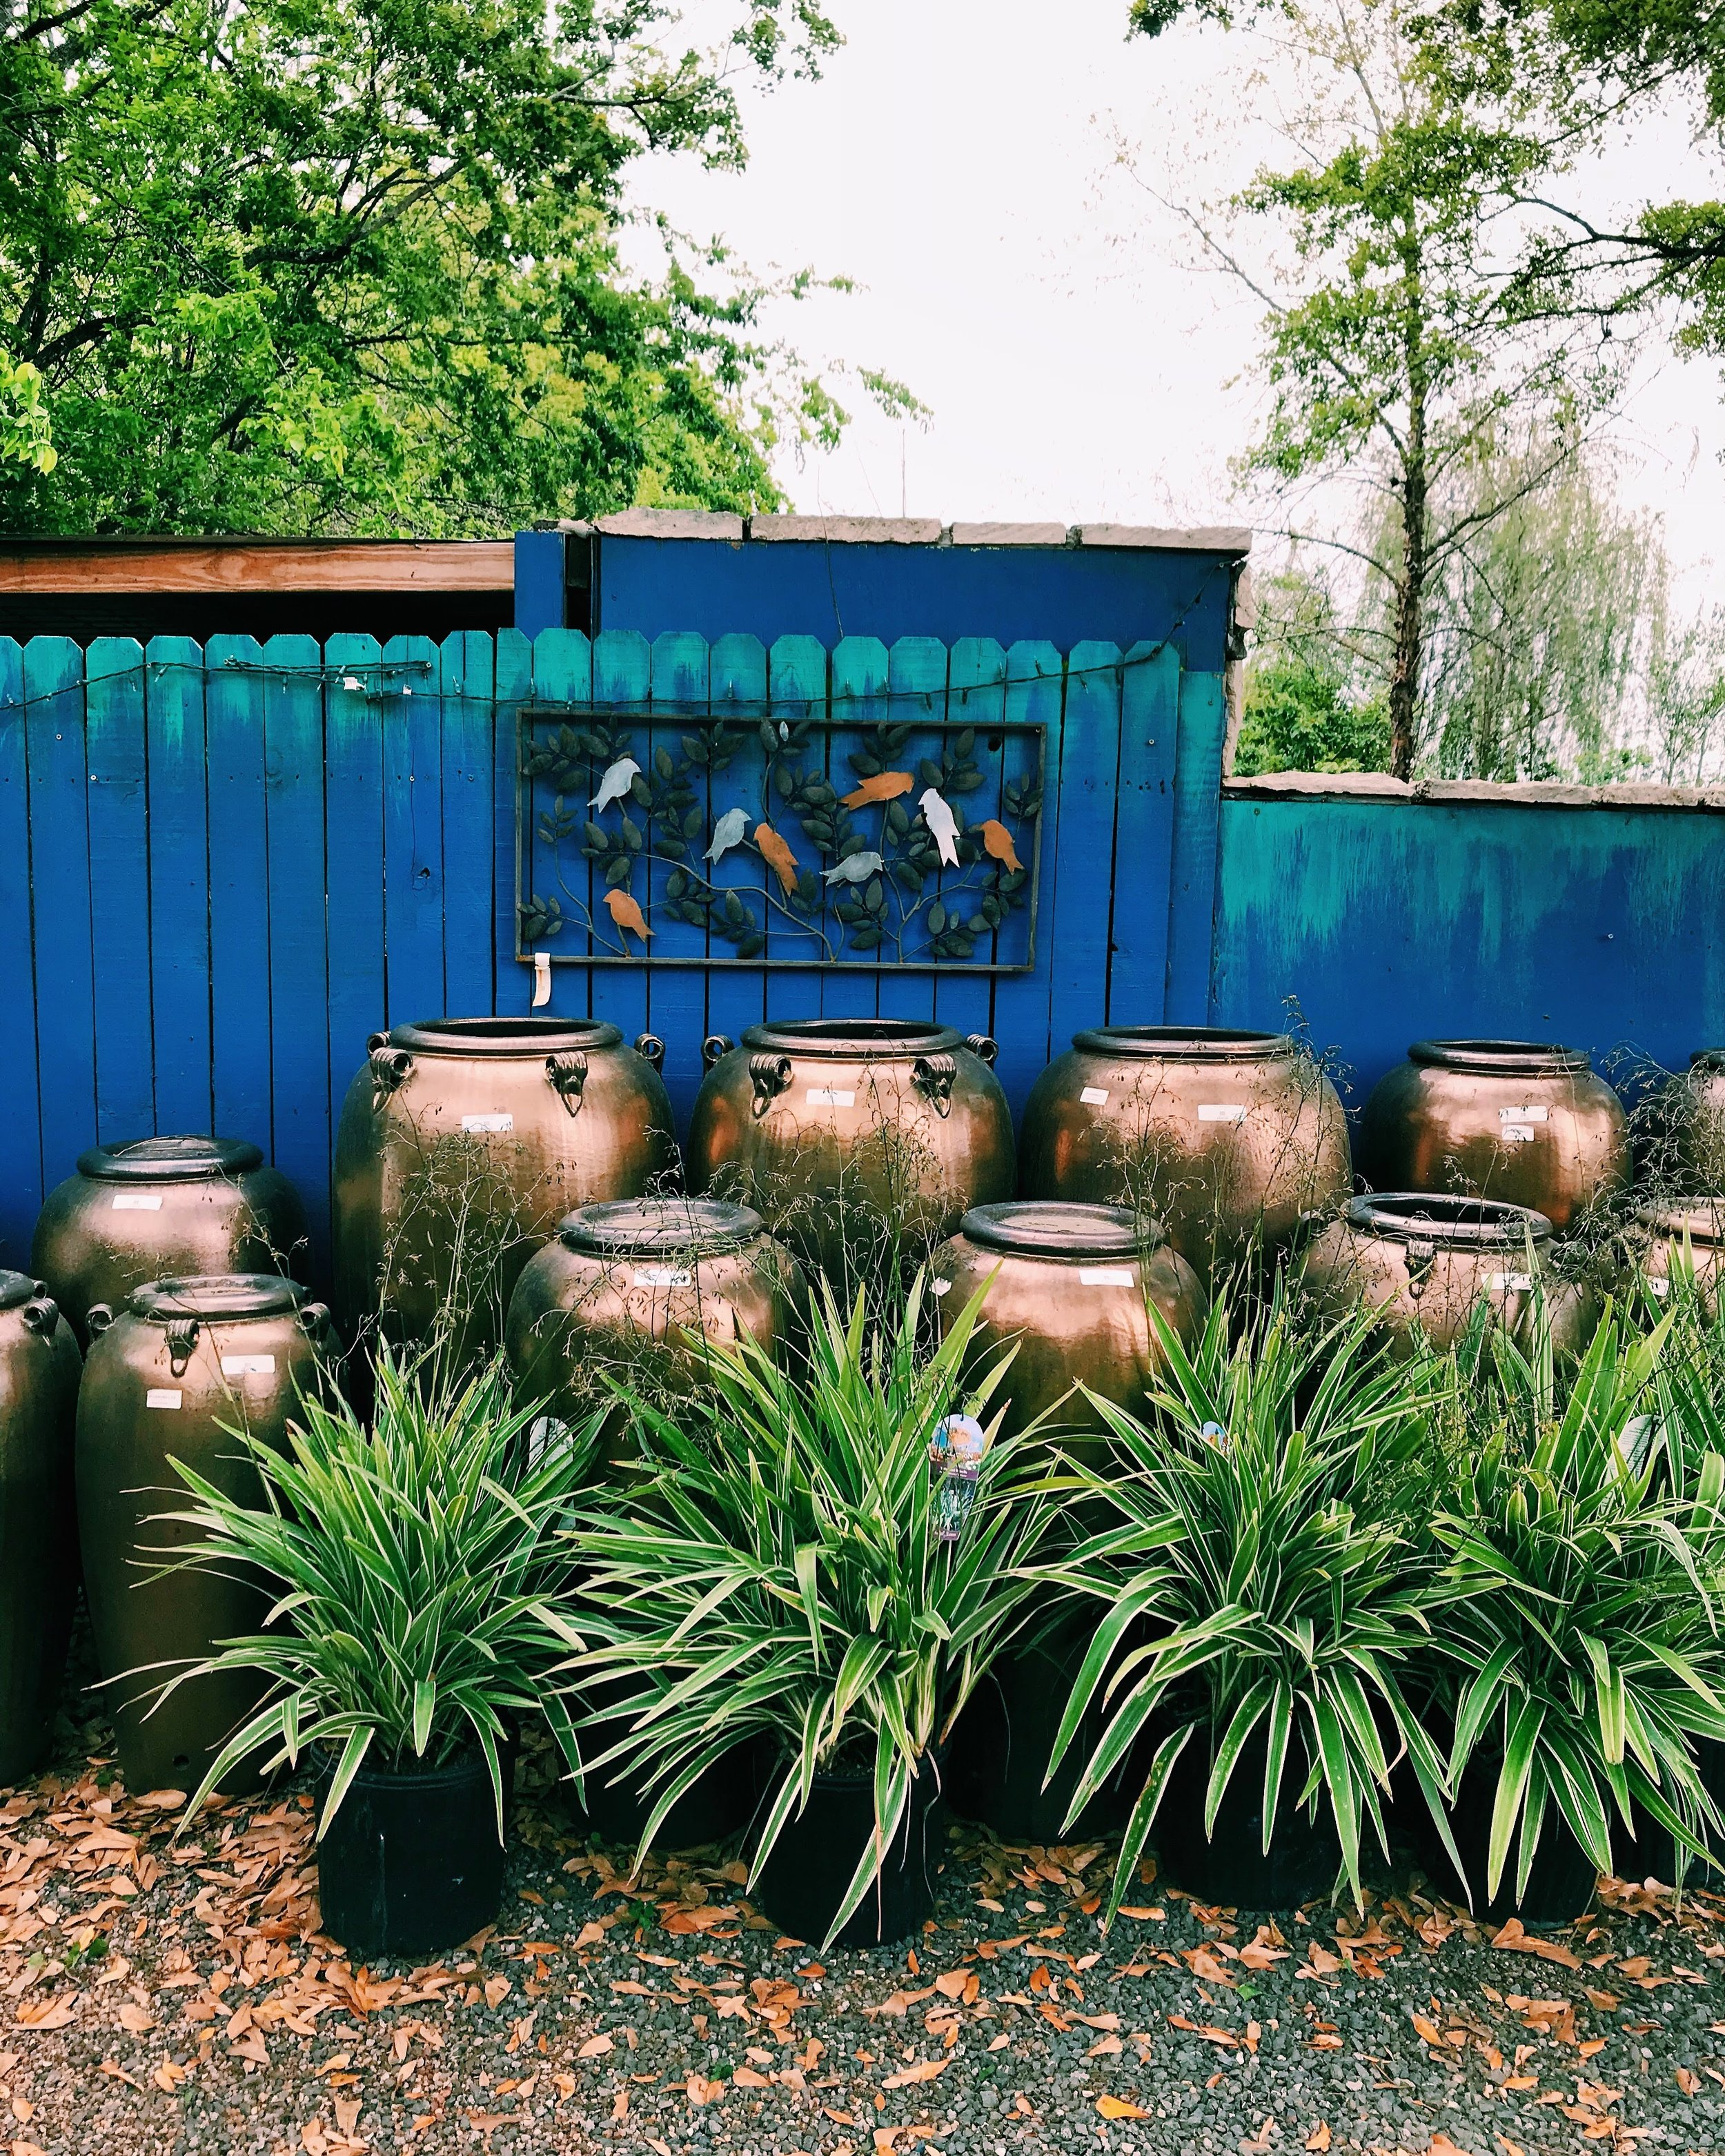 Three Heel Clicks - Houston Hotspots - Nelson Water Gardens (4).jpg